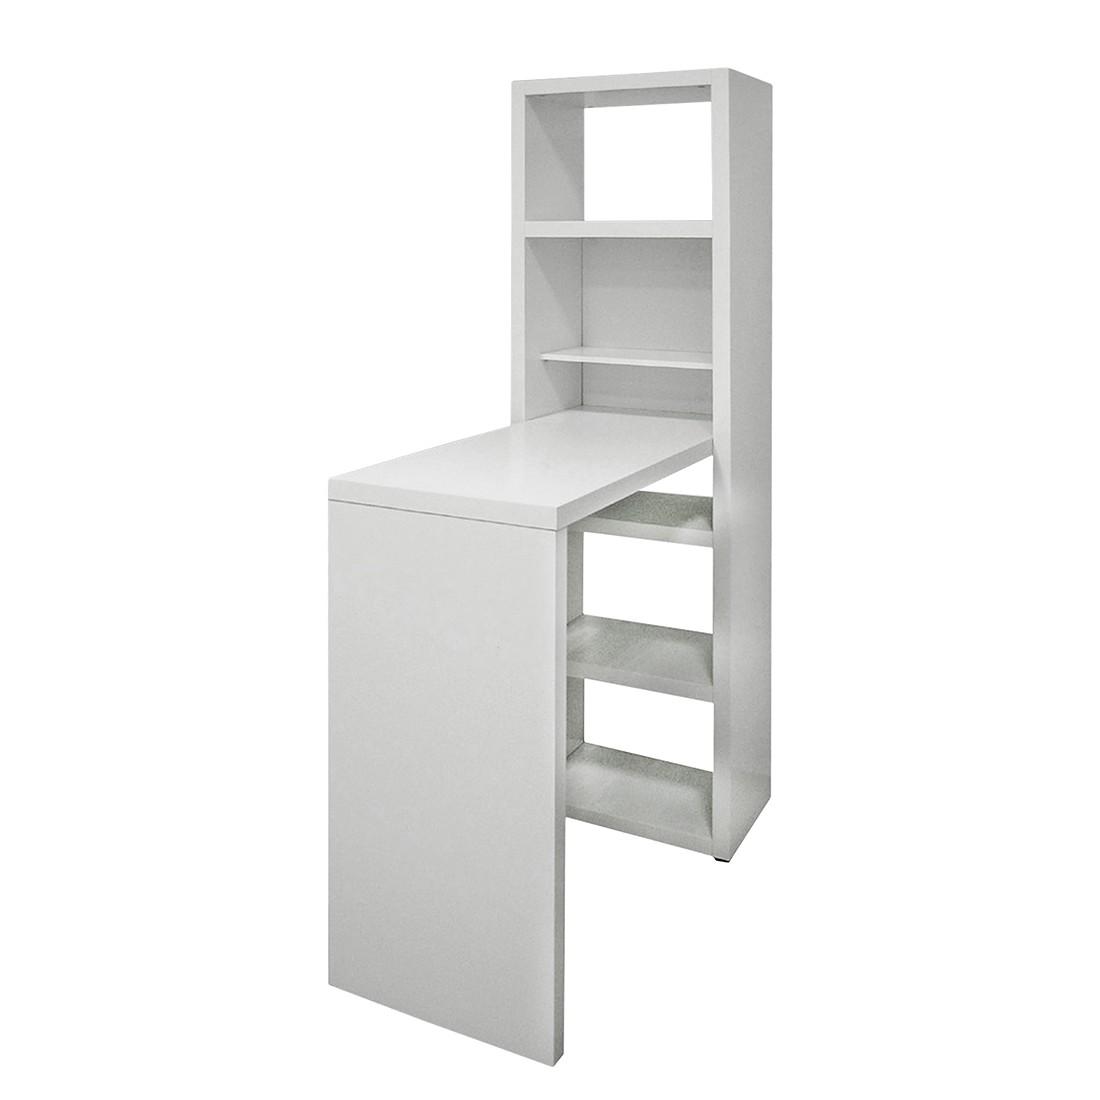 Regal-Tischkombination Lokeren - Weiß, Fredriks